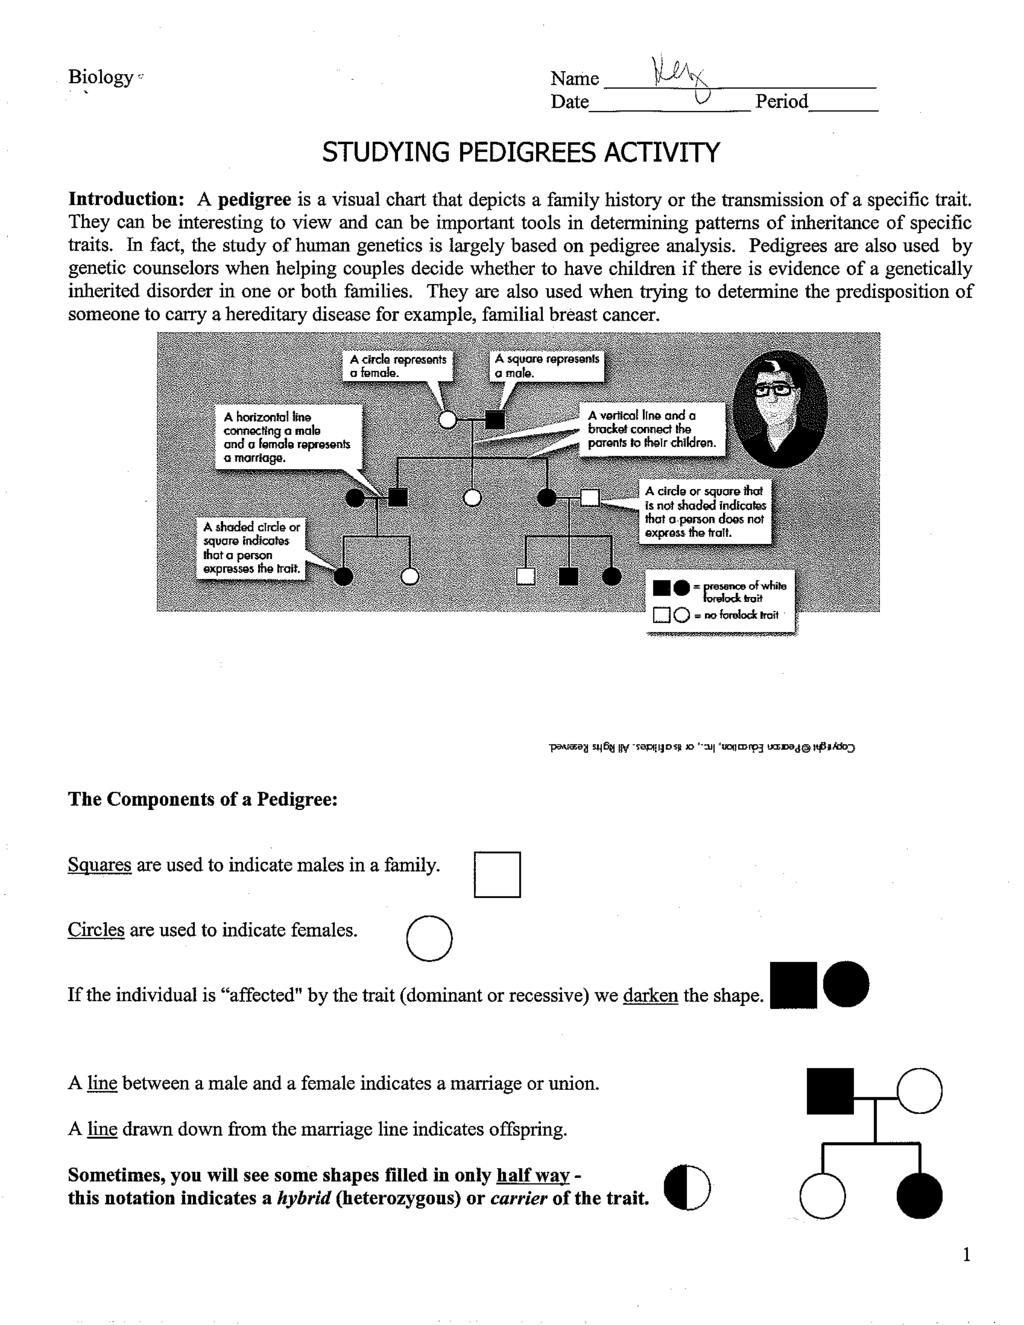 Pedigree Worksheet Answer Key Datee Studying Pedigrees Activity Pdf Free Download